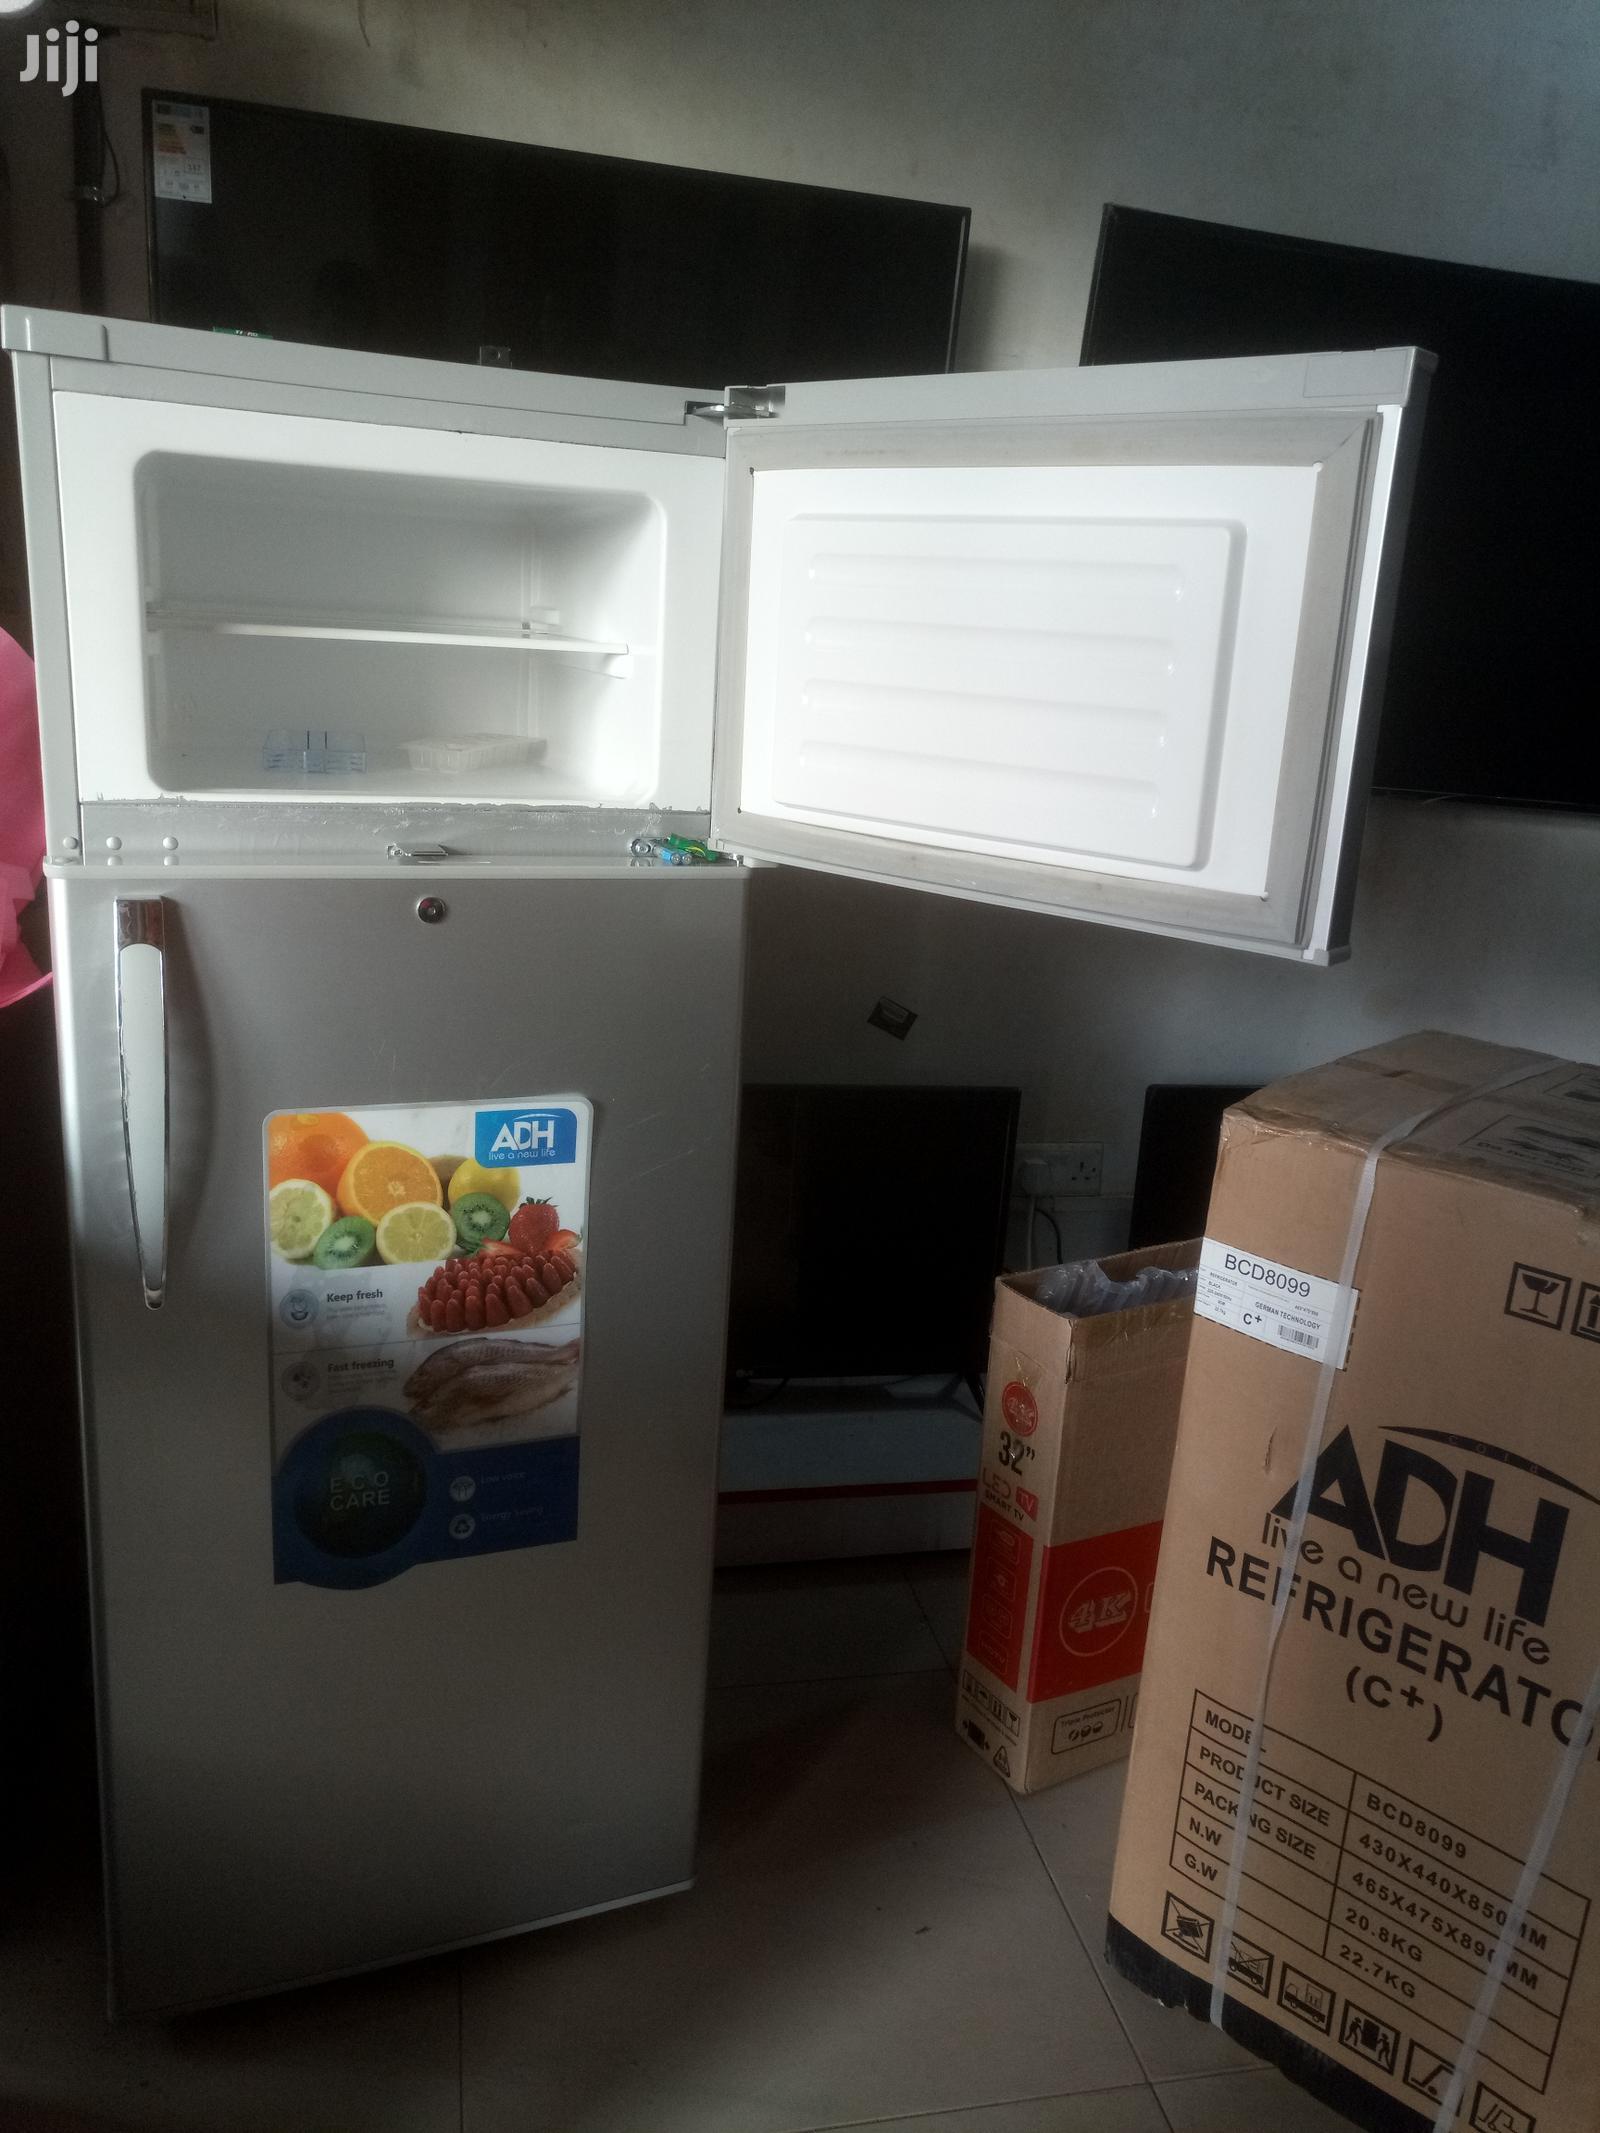 Adh 220 Litres Double Door Refrigerator   Kitchen Appliances for sale in Kampala, Central Region, Uganda